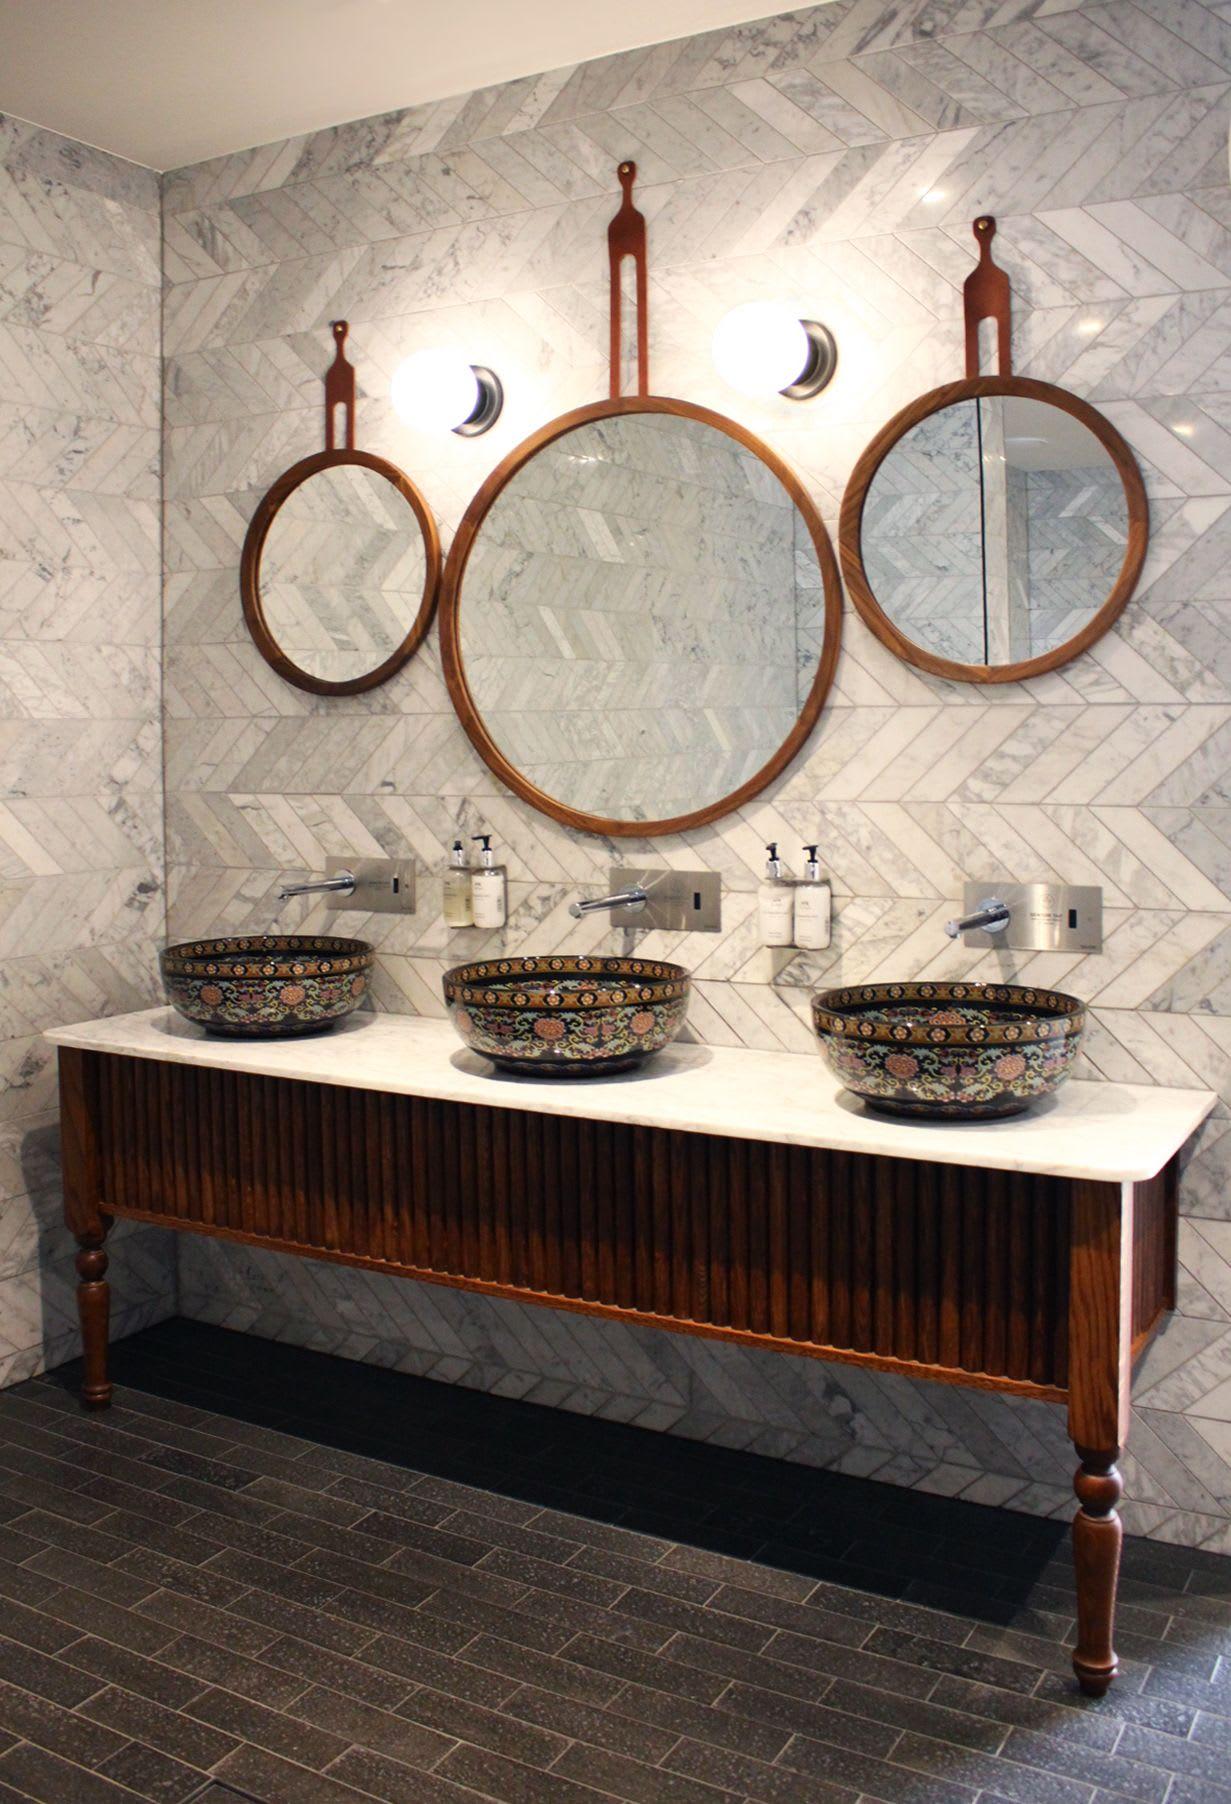 Hanging circle bathroom mirrors